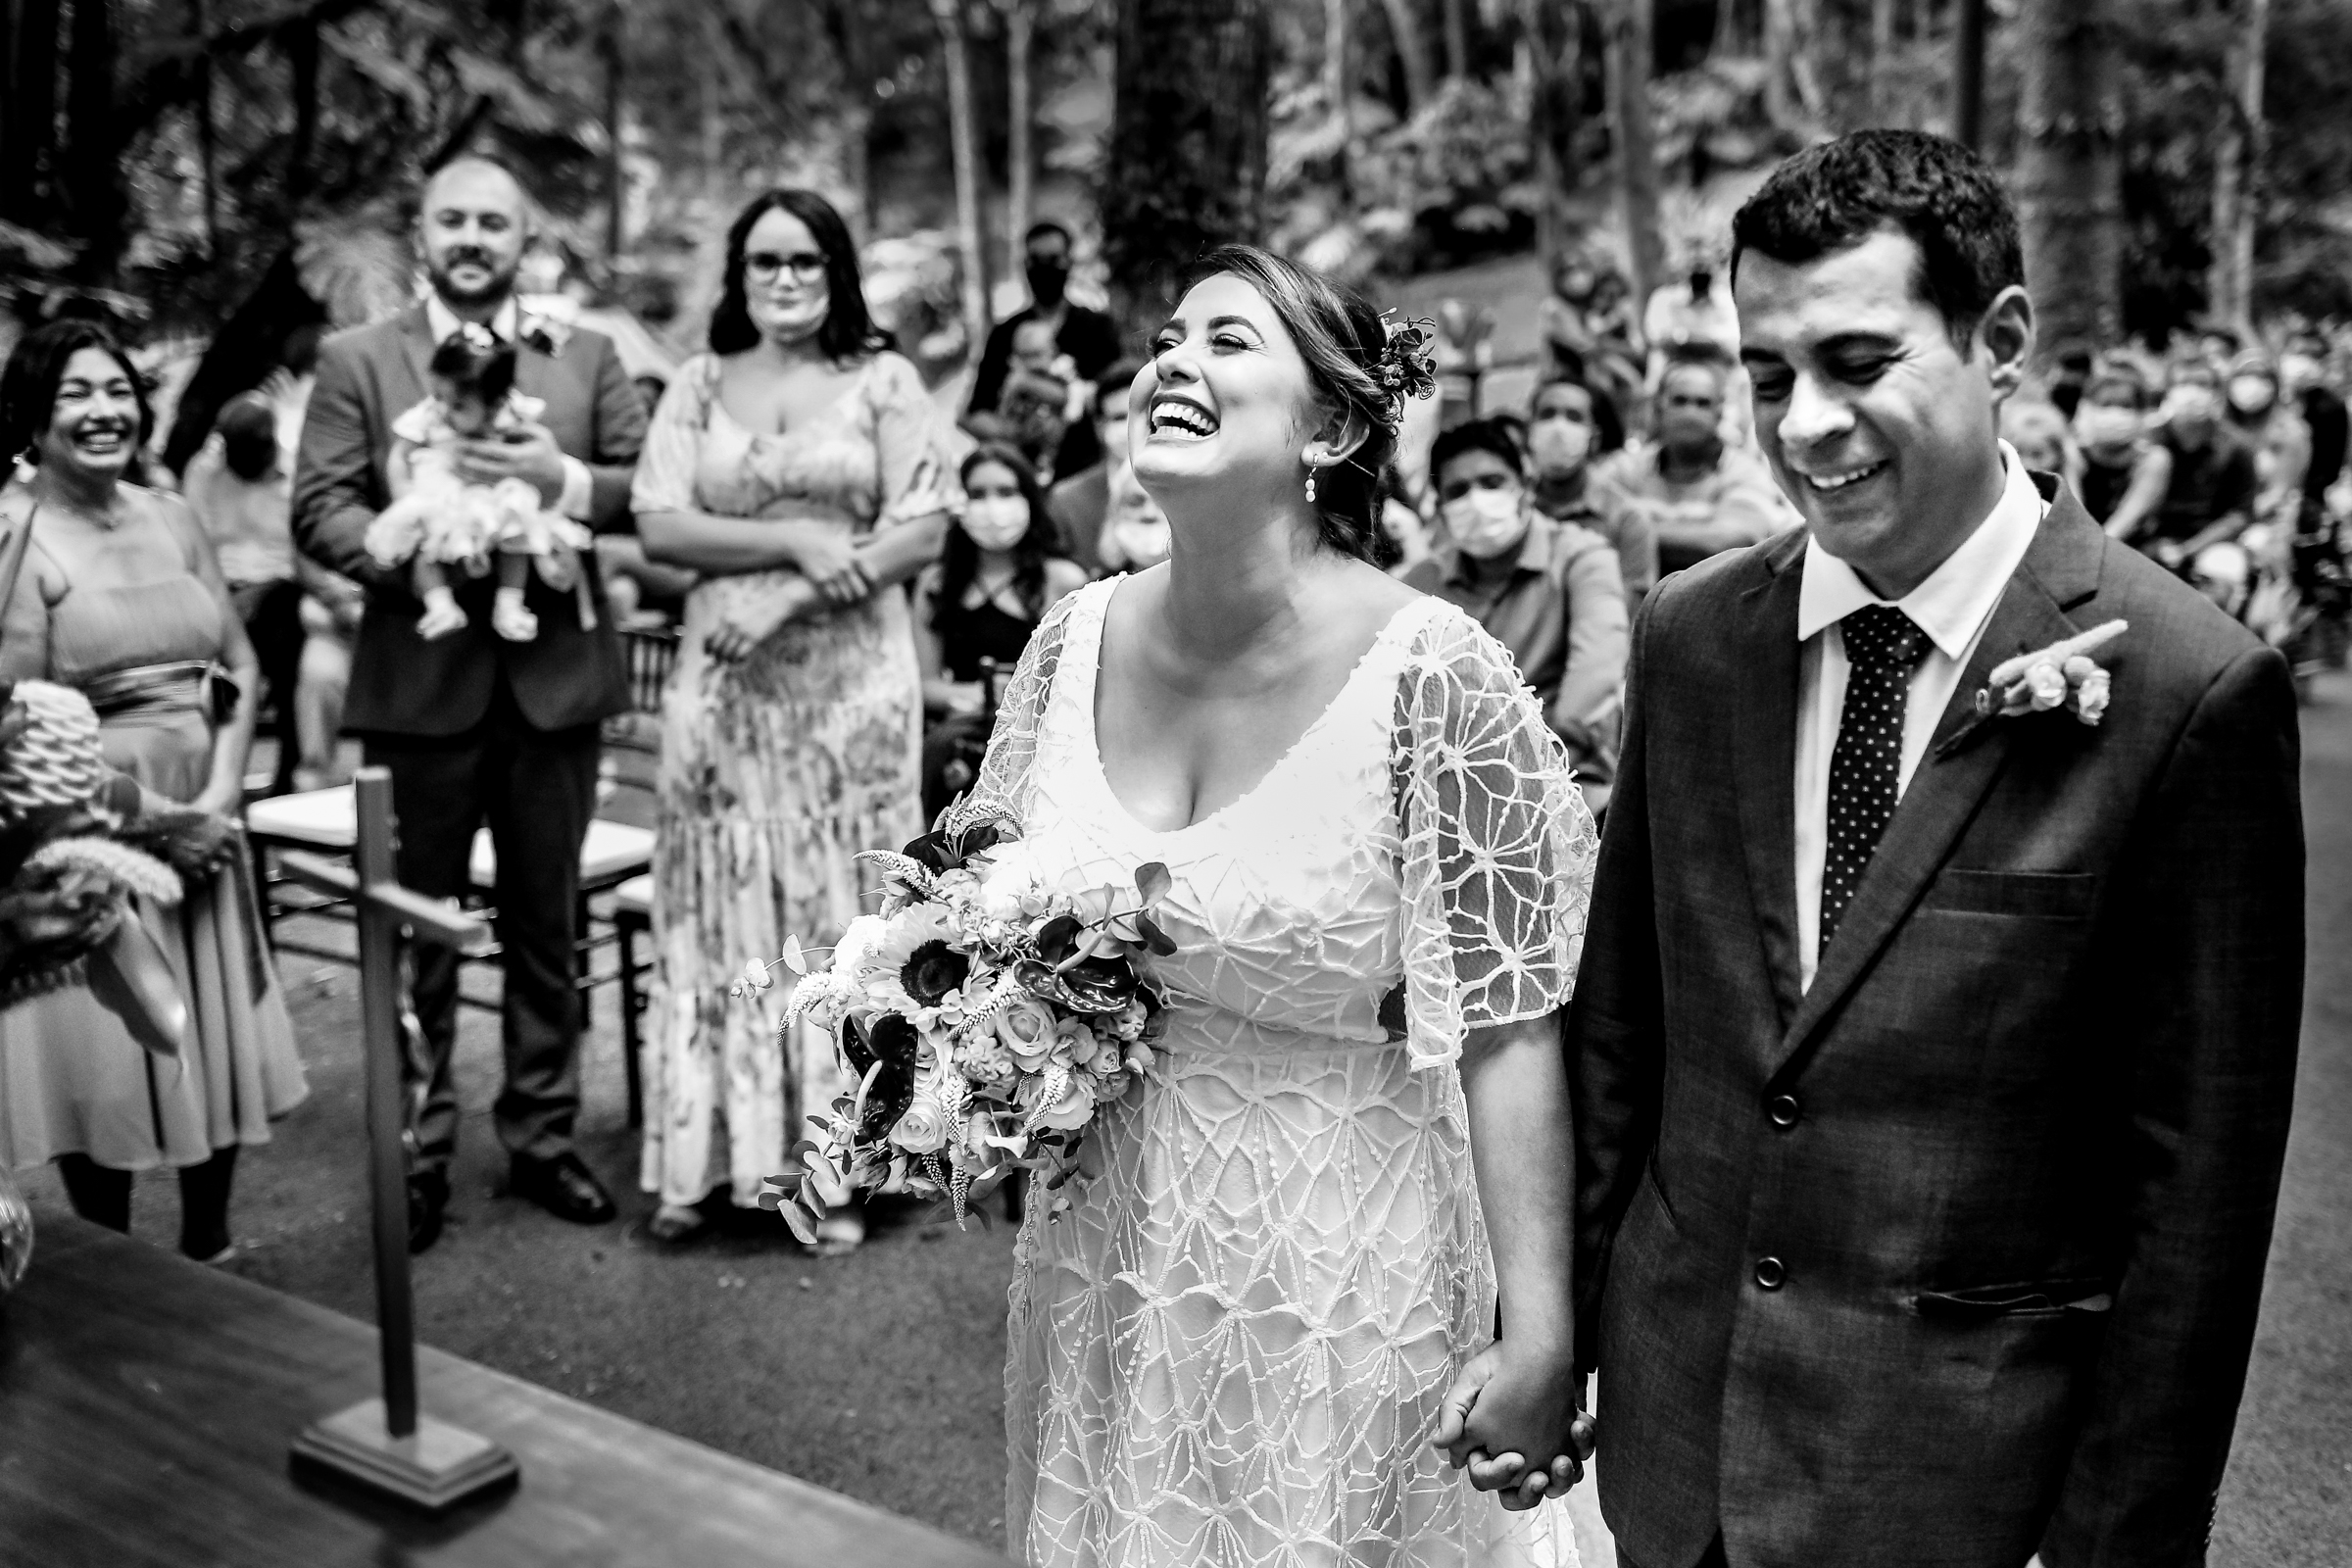 couple-emotion-at-ceremony-area-da-fotografia